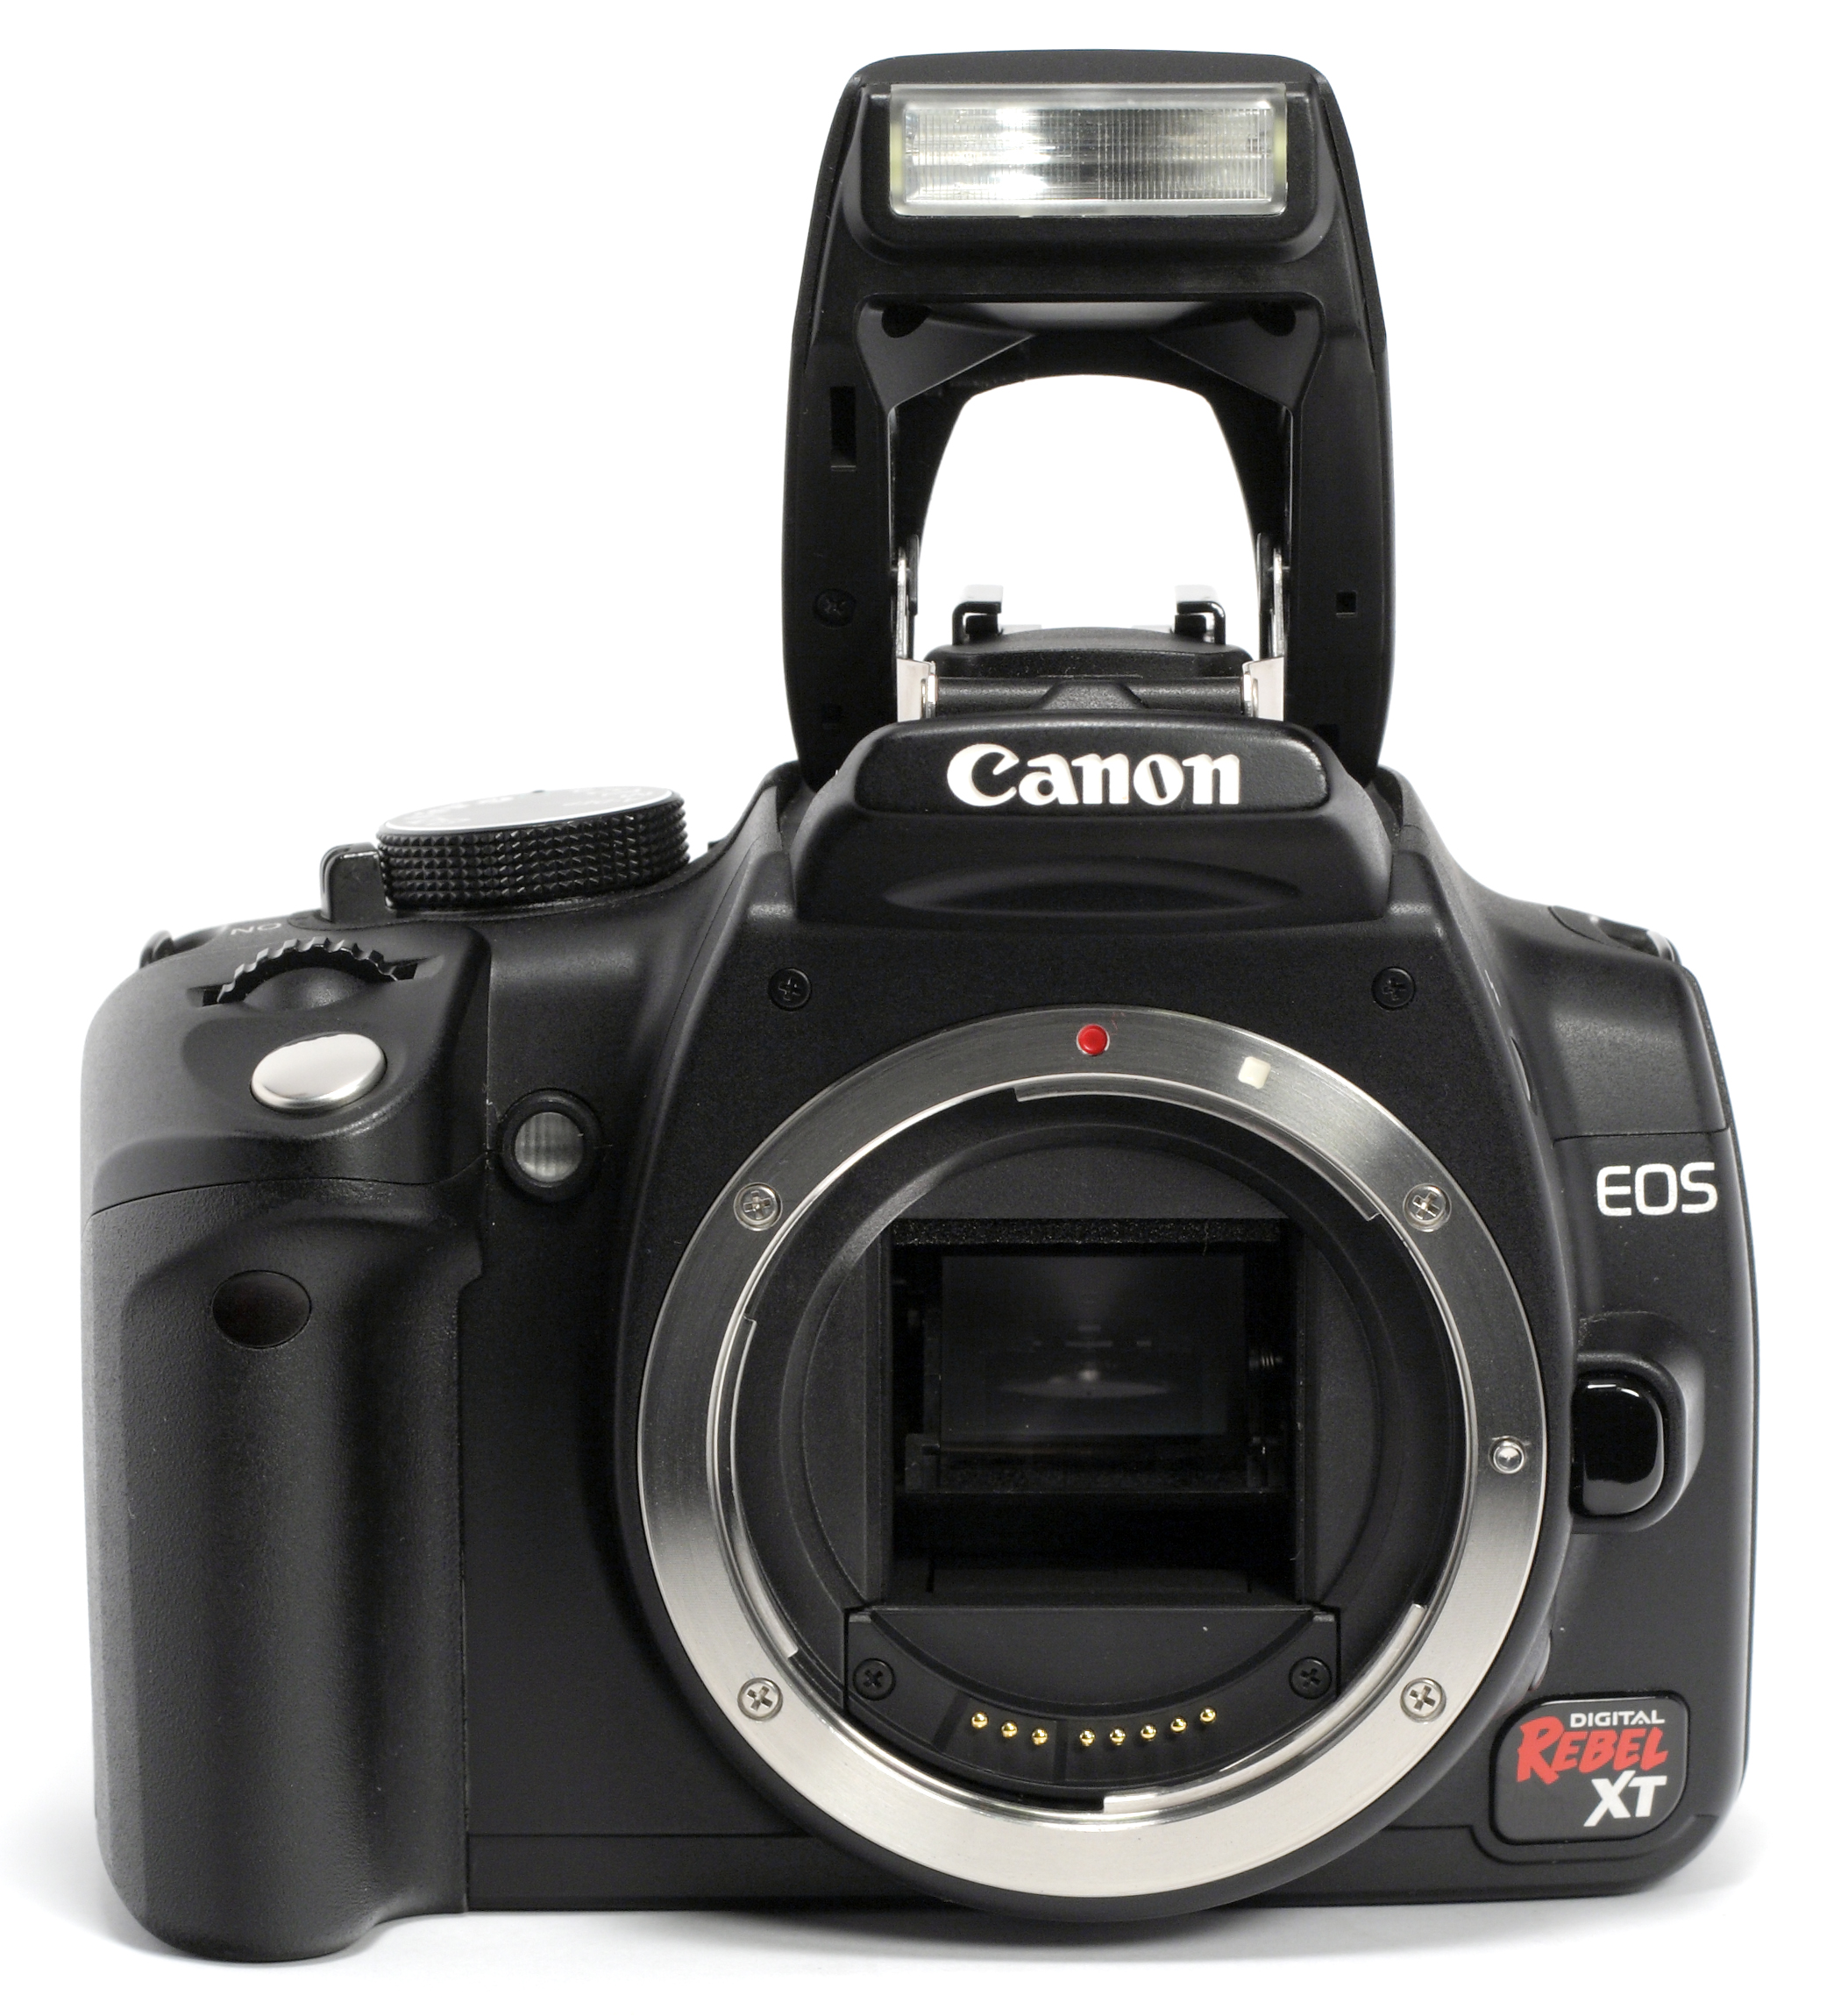 Canon_EOS_Rebel_XT.JPG